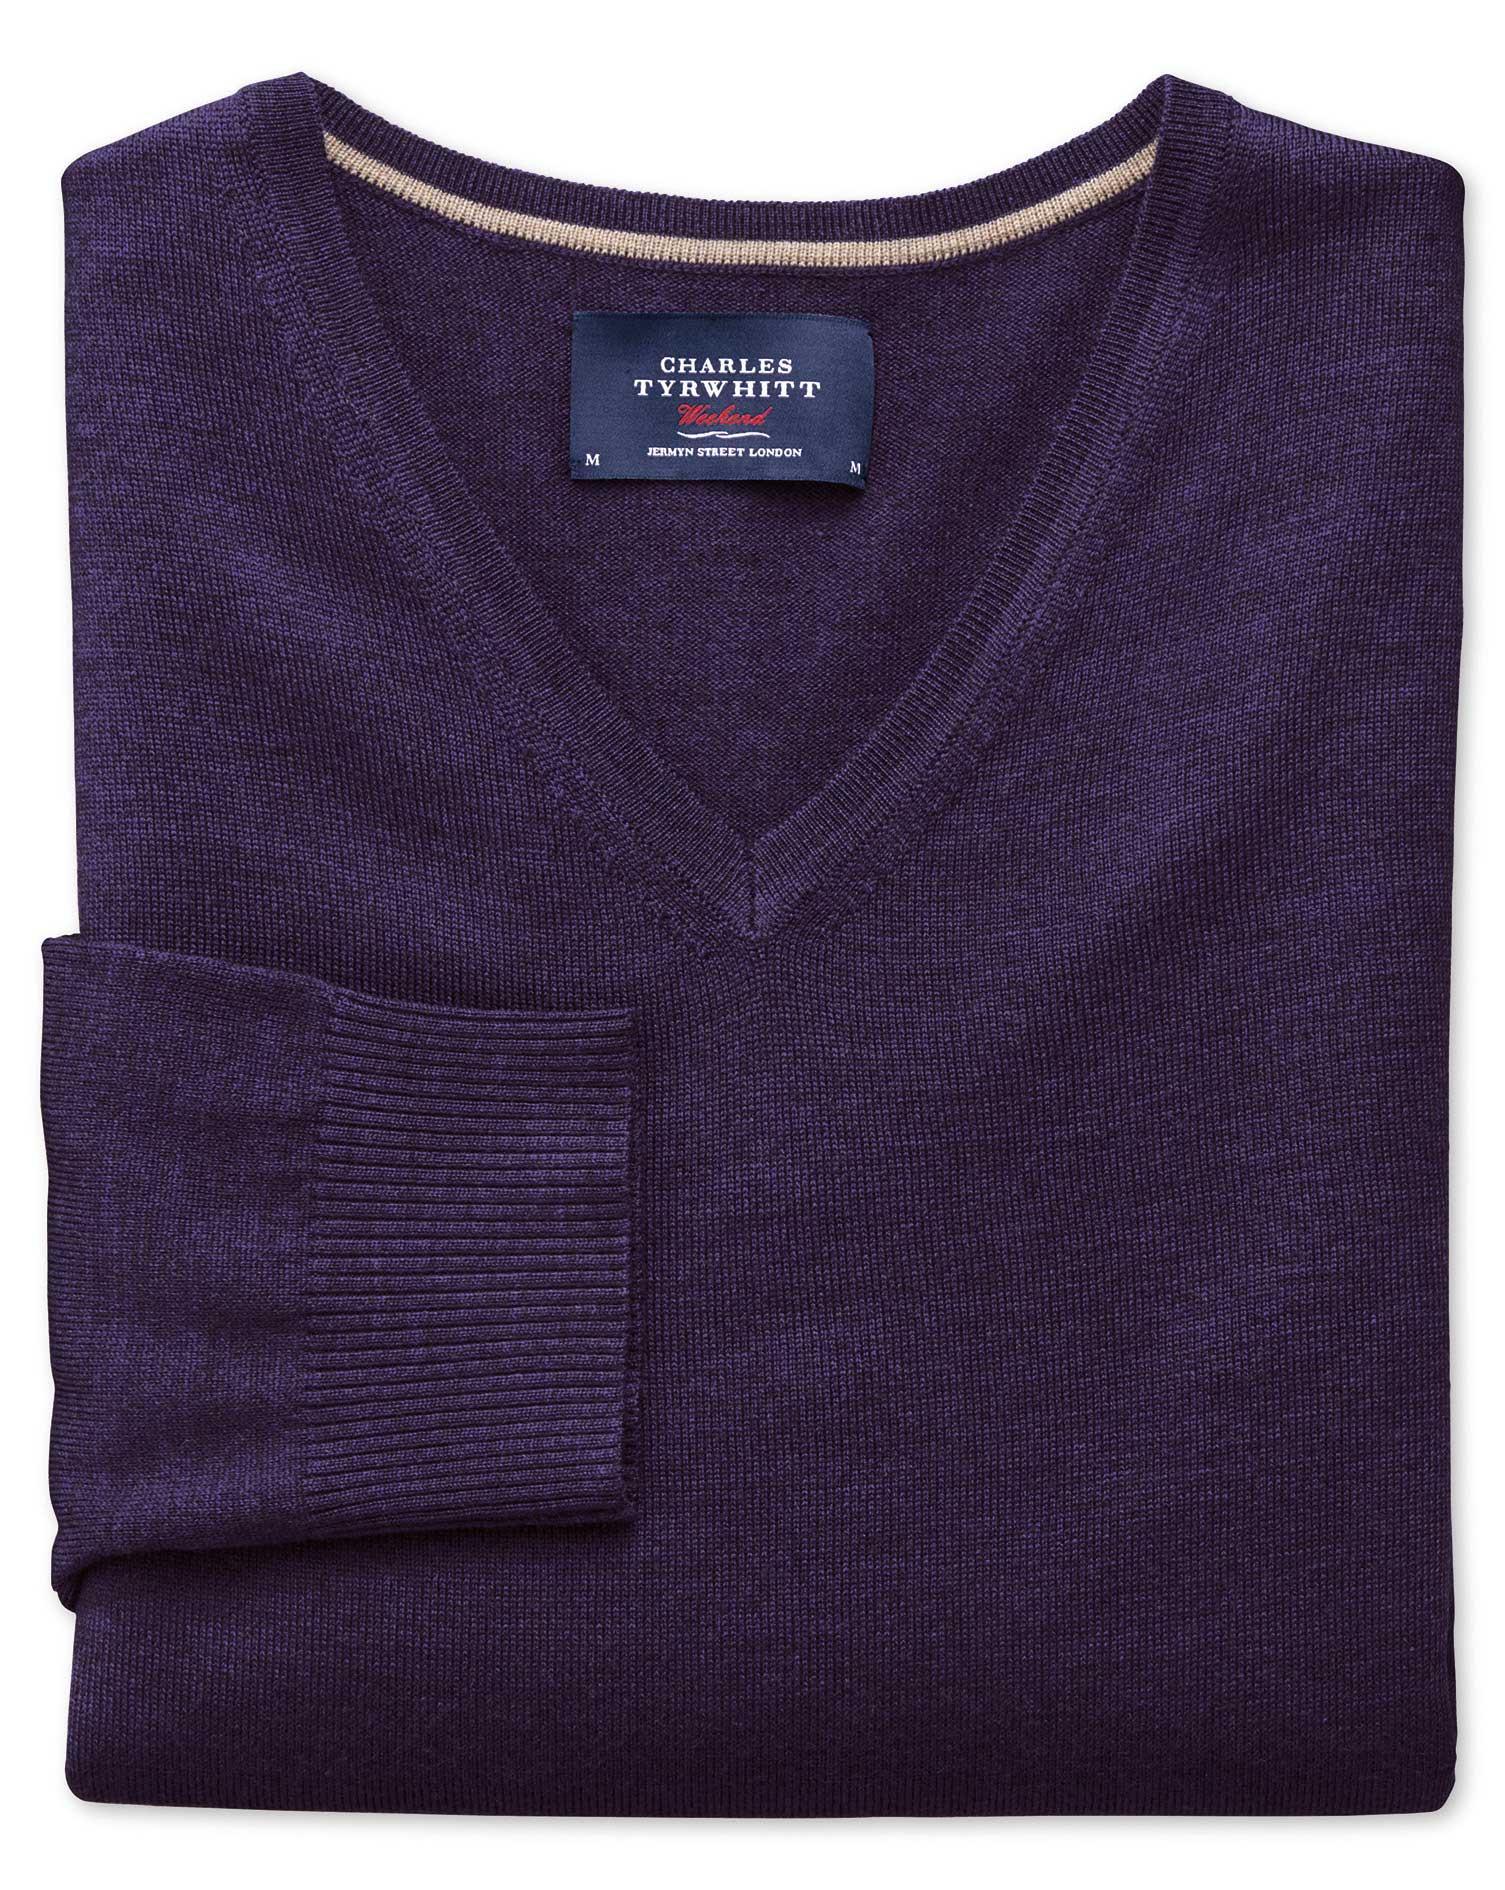 Purple Merino Wool V-Neck Jumper Size Large by Charles Tyrwhitt